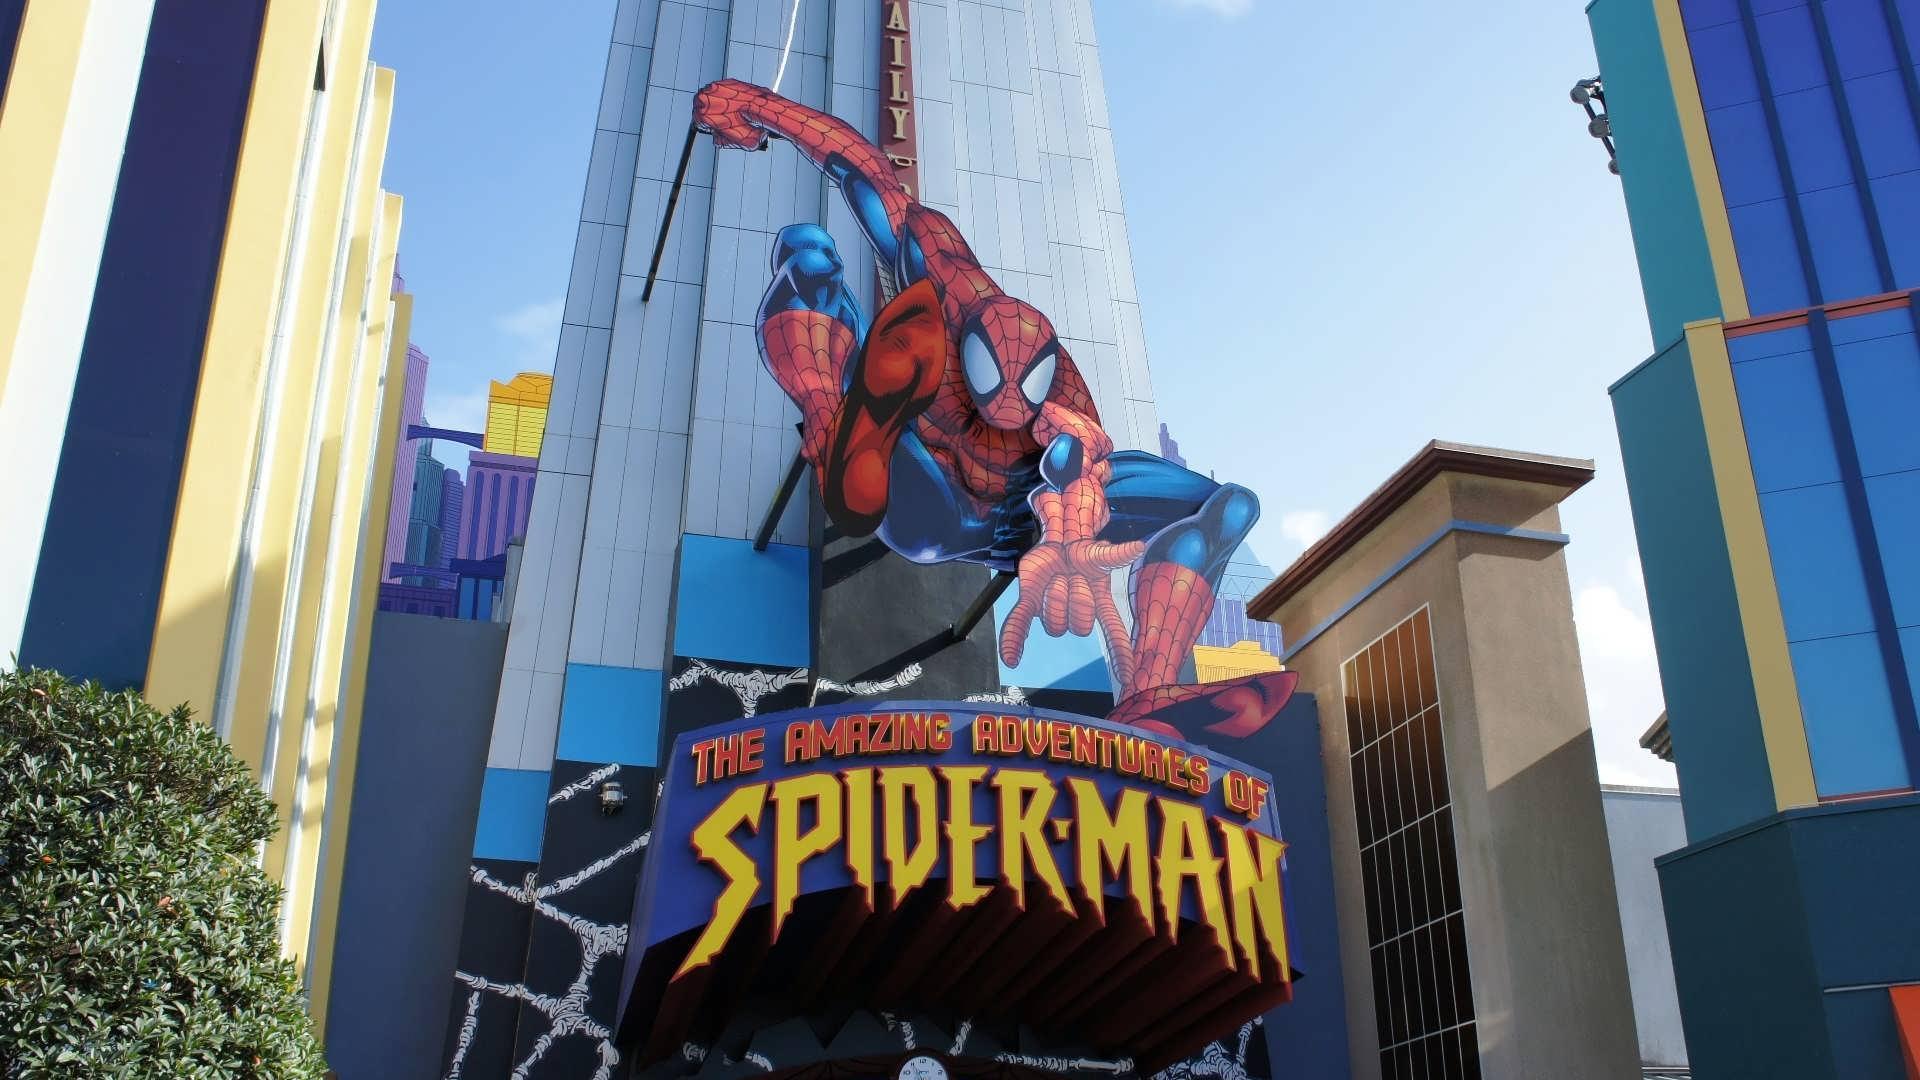 Amazing Adventures Of Spiderman Orlando Tickets Hotels